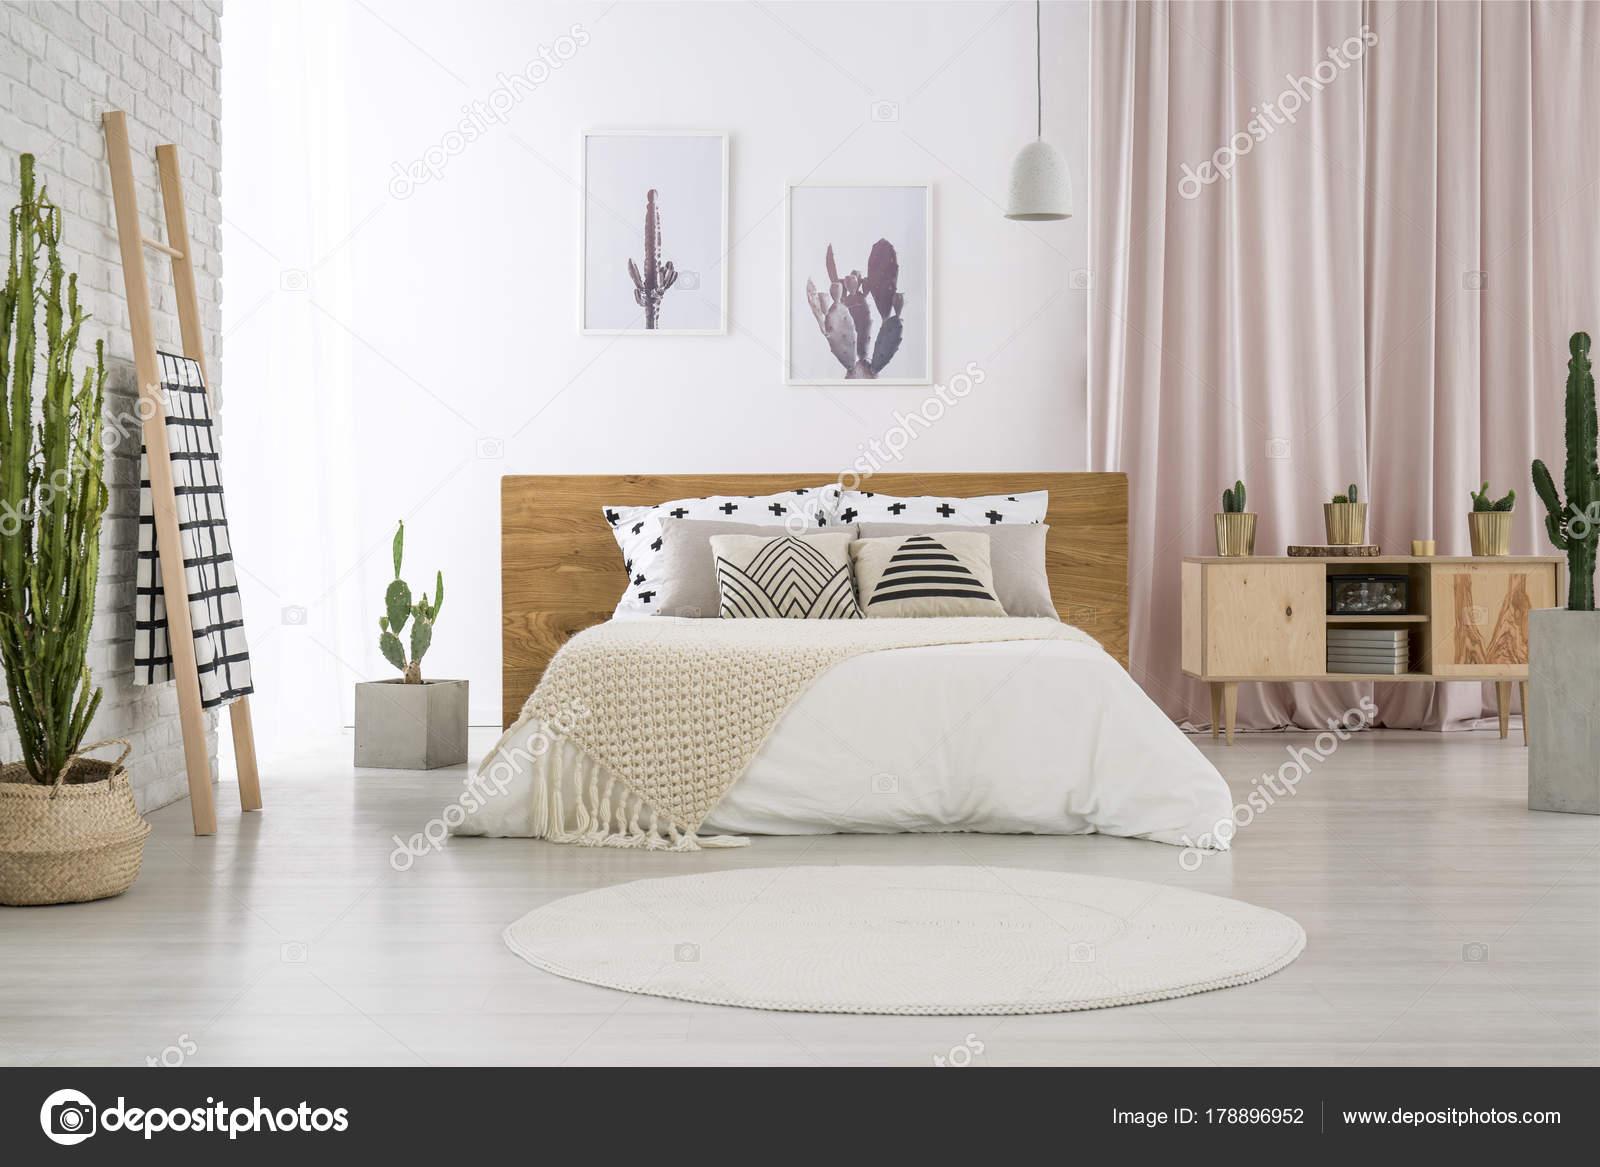 Helle Schlafzimmer Mit Kaktus Motiv U2014 Stockfoto